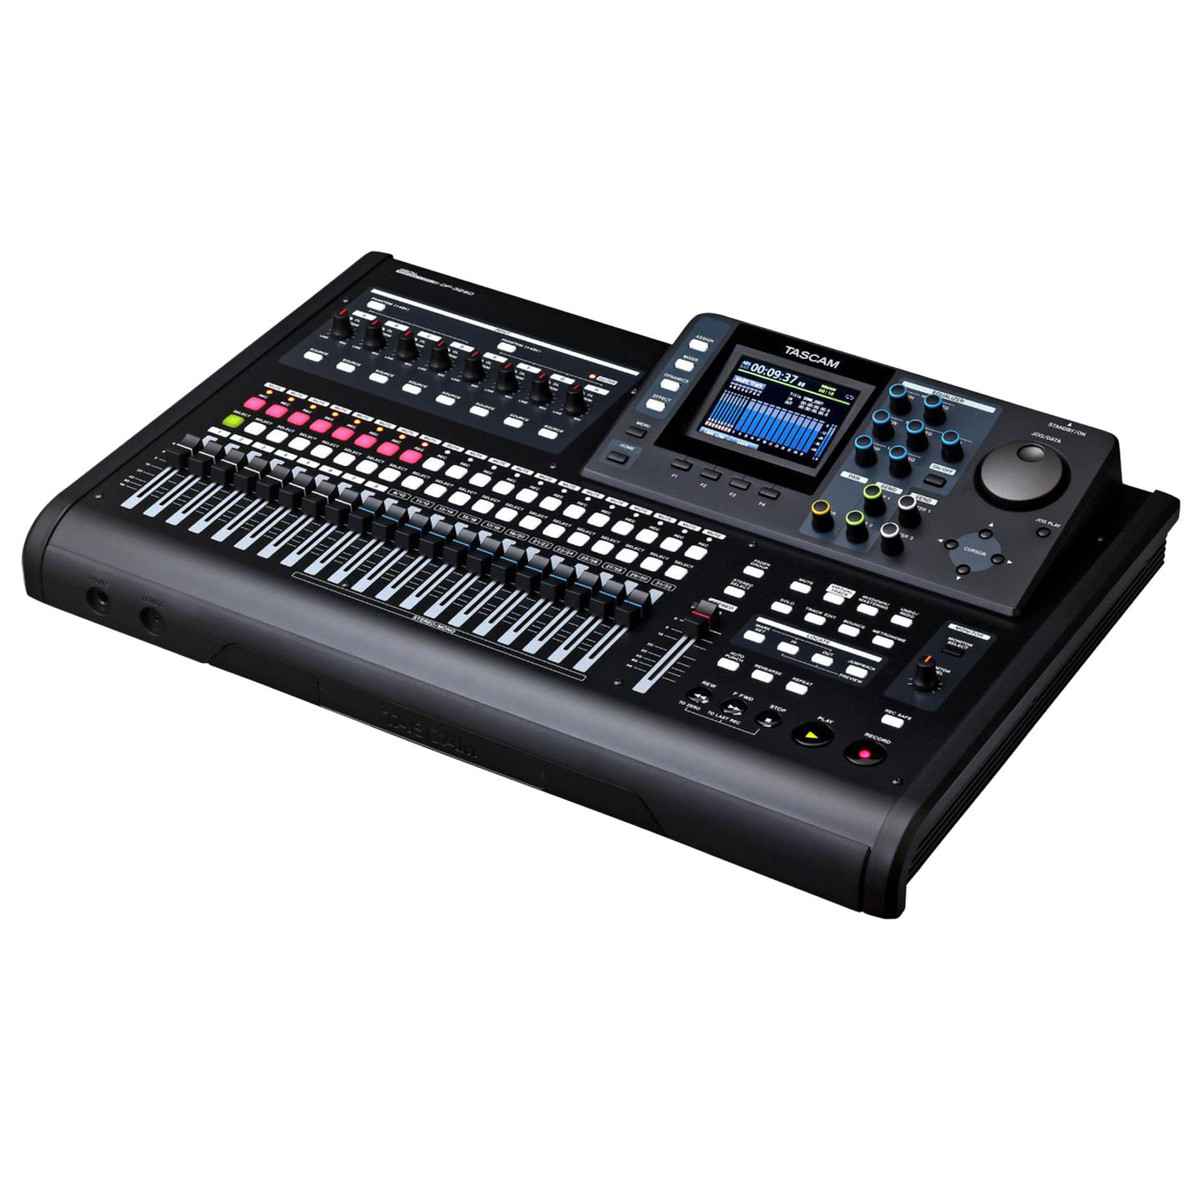 tascam dp 32sd digital multitrack recorder ex demo at gear4music. Black Bedroom Furniture Sets. Home Design Ideas